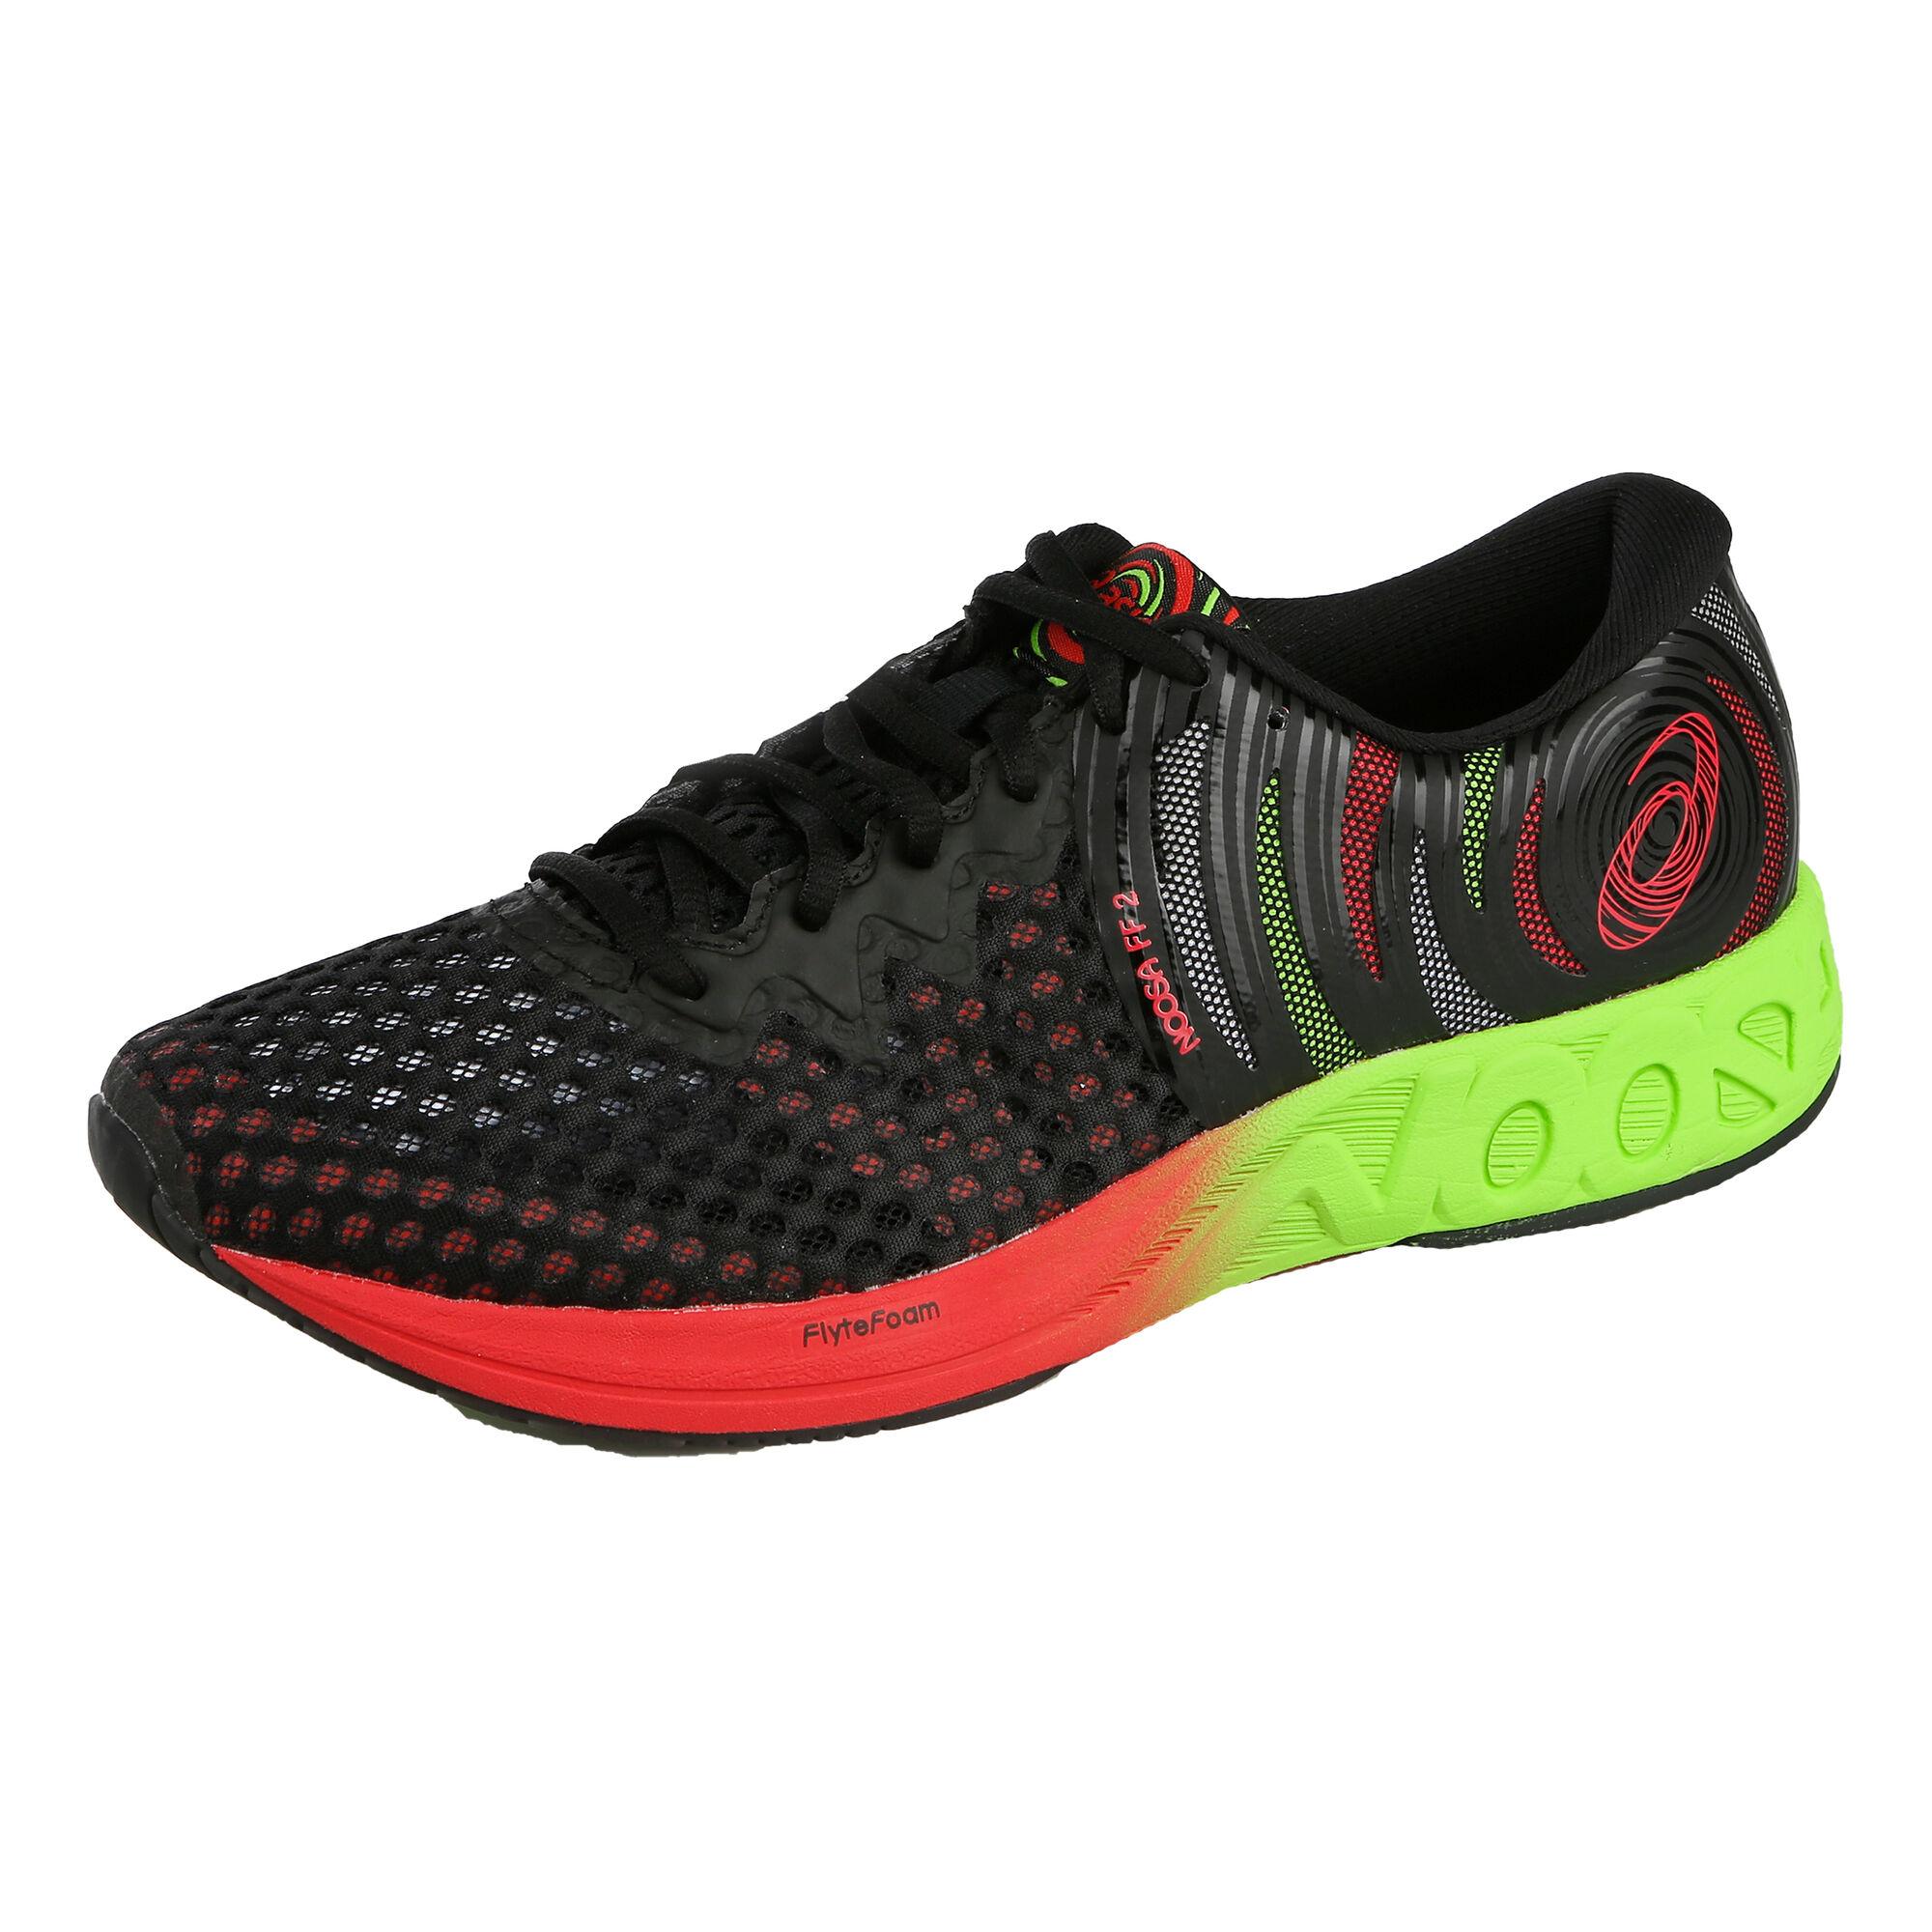 5e7cdf5b956 buy Asics Noosa FF 2 Competition Running Shoe Men - Black, Red ...